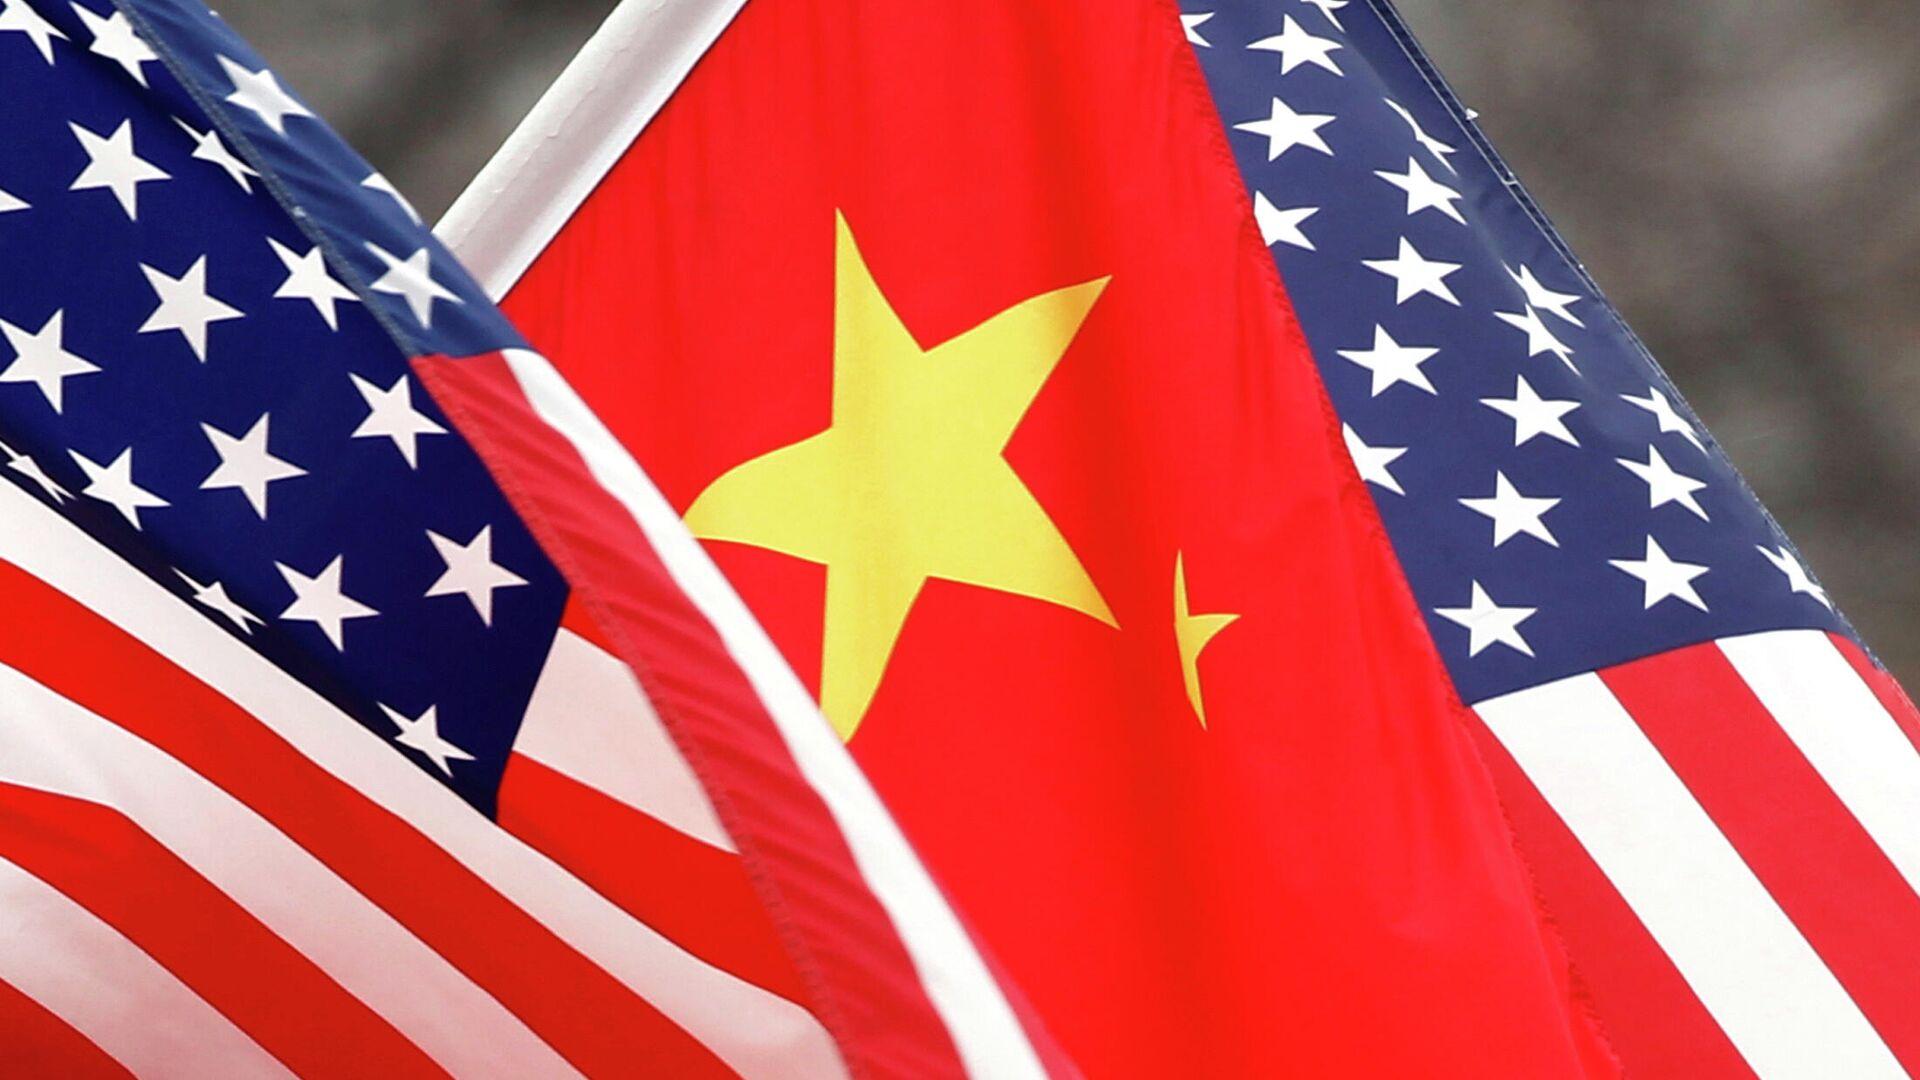 Флаги Китая и США - РИА Новости, 1920, 15.01.2021